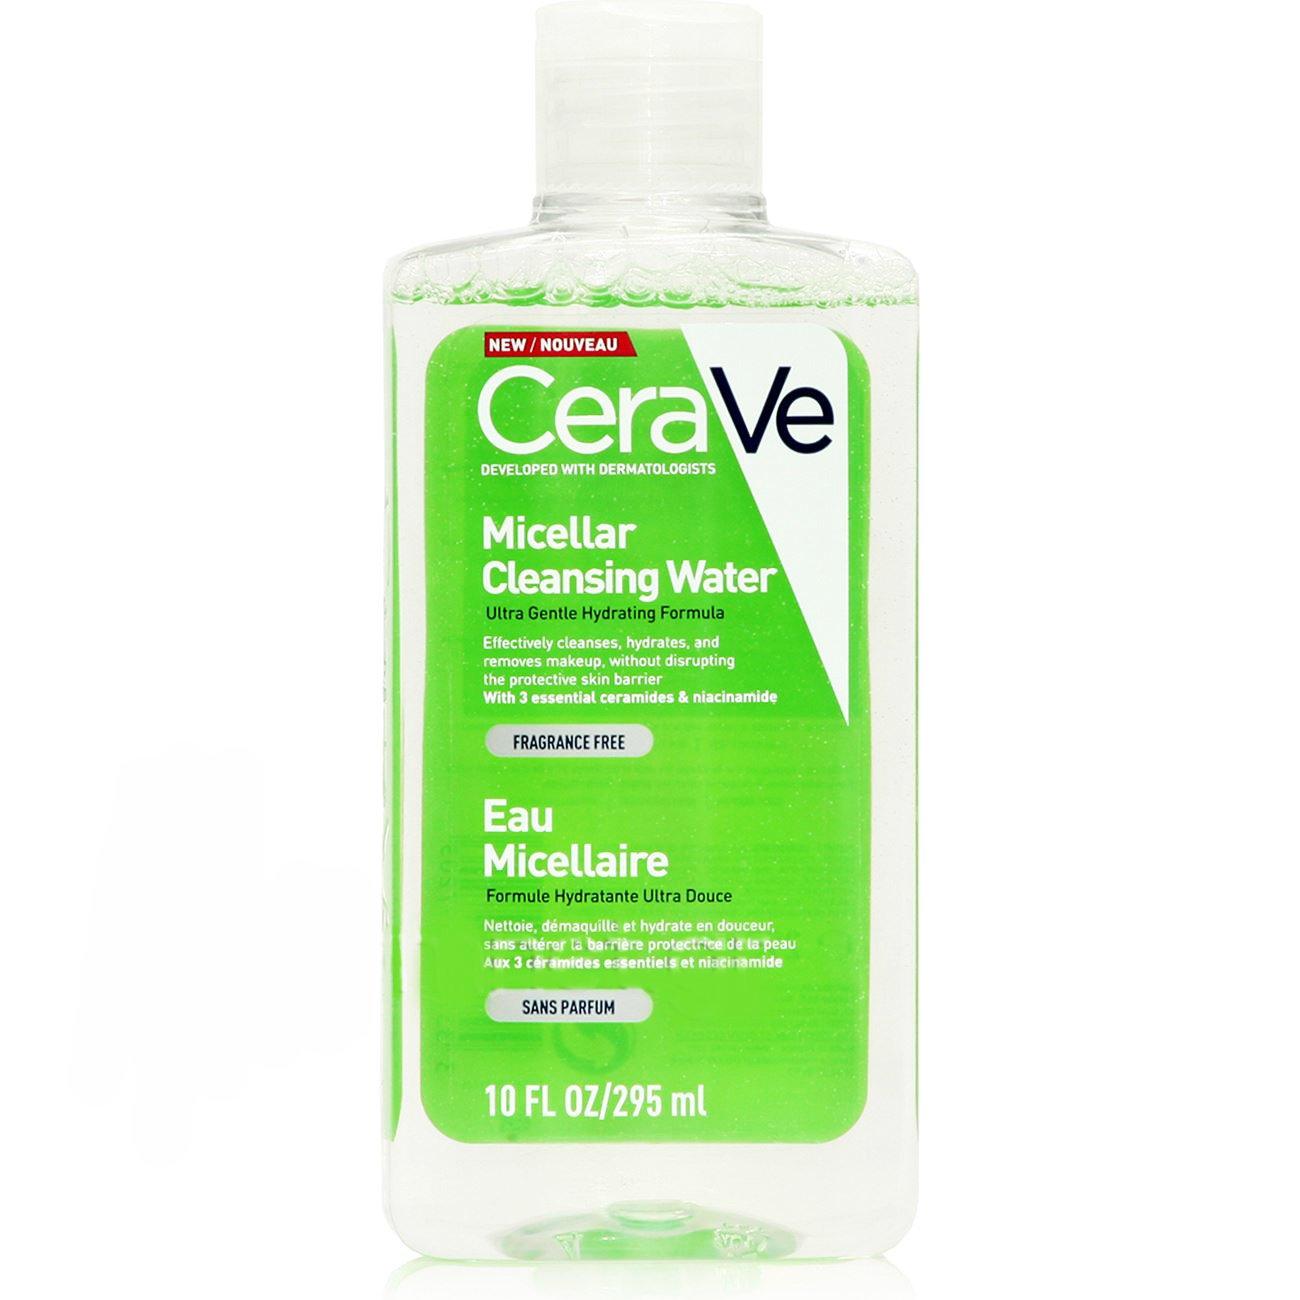 CeraVe Micellar Cleansing Water Νερό Καθαρισμού & Ντεμακιγιάζ Προσώπου, Ματιών & Χειλιών 295ml